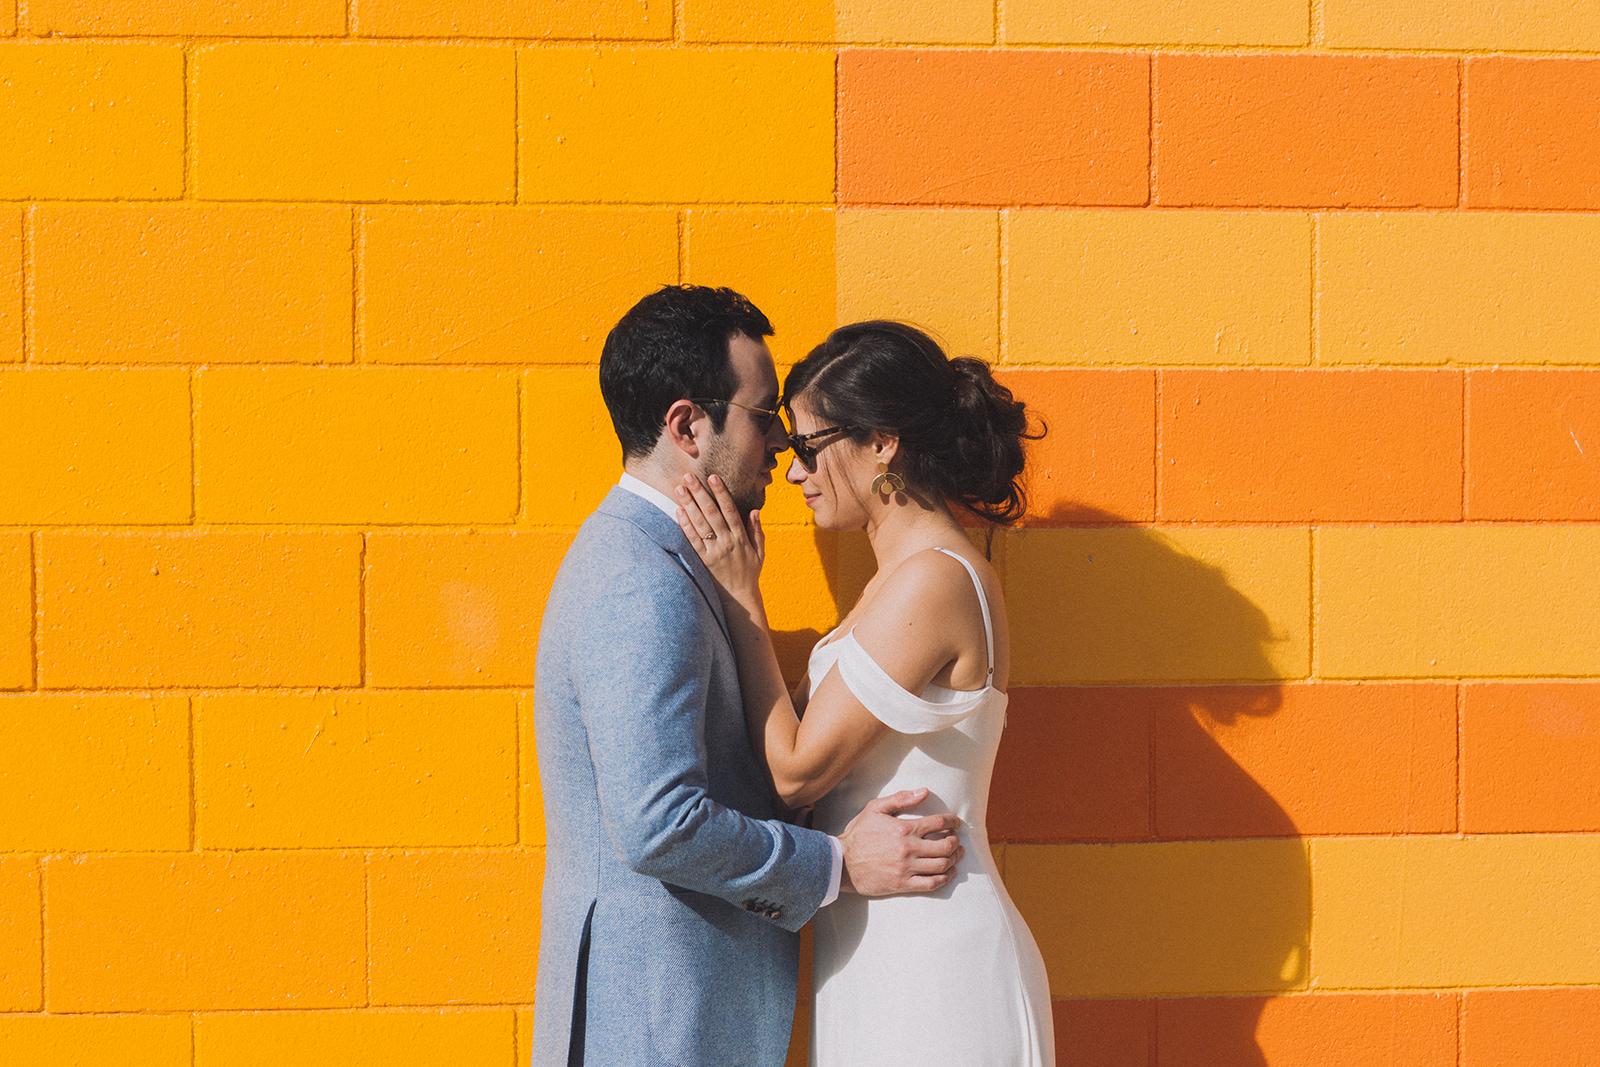 Bride and groom sunglasses painted mural ace palm springs.jpg